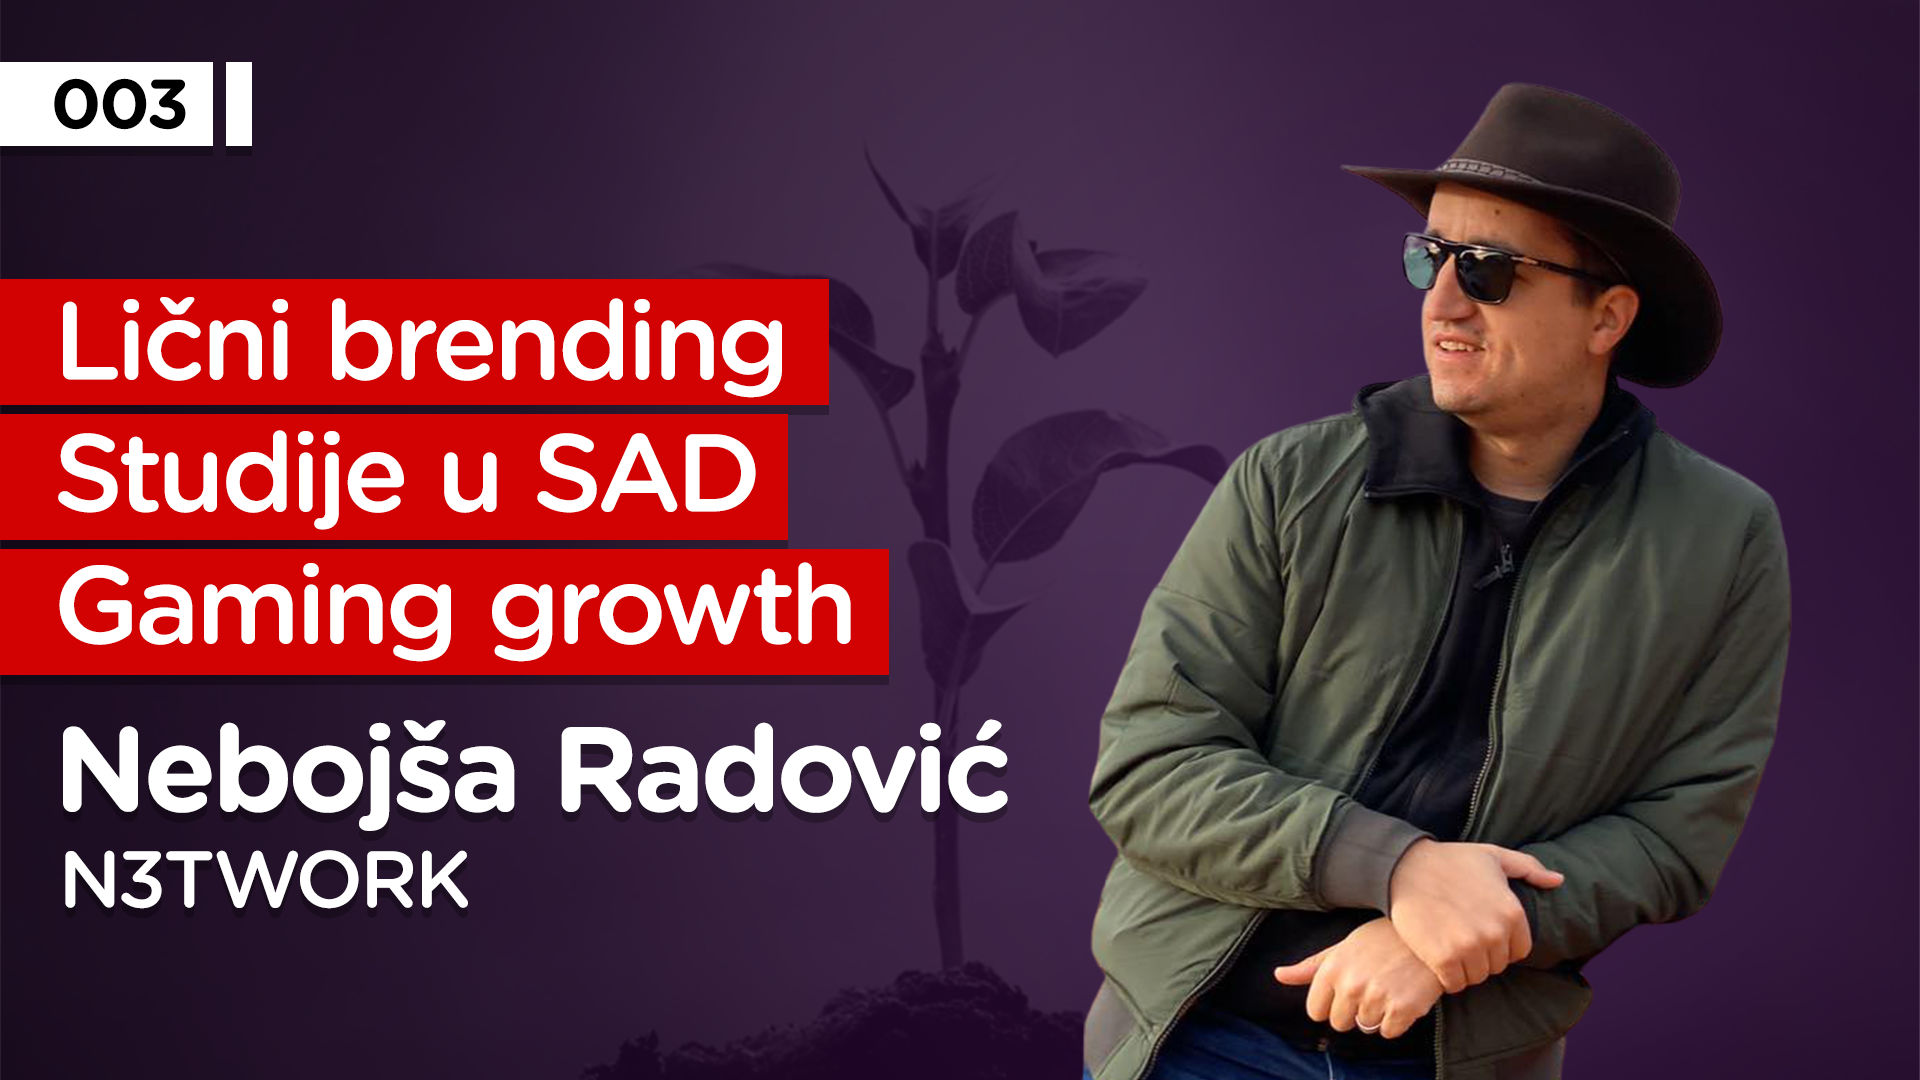 EP003: Nebojša Radović